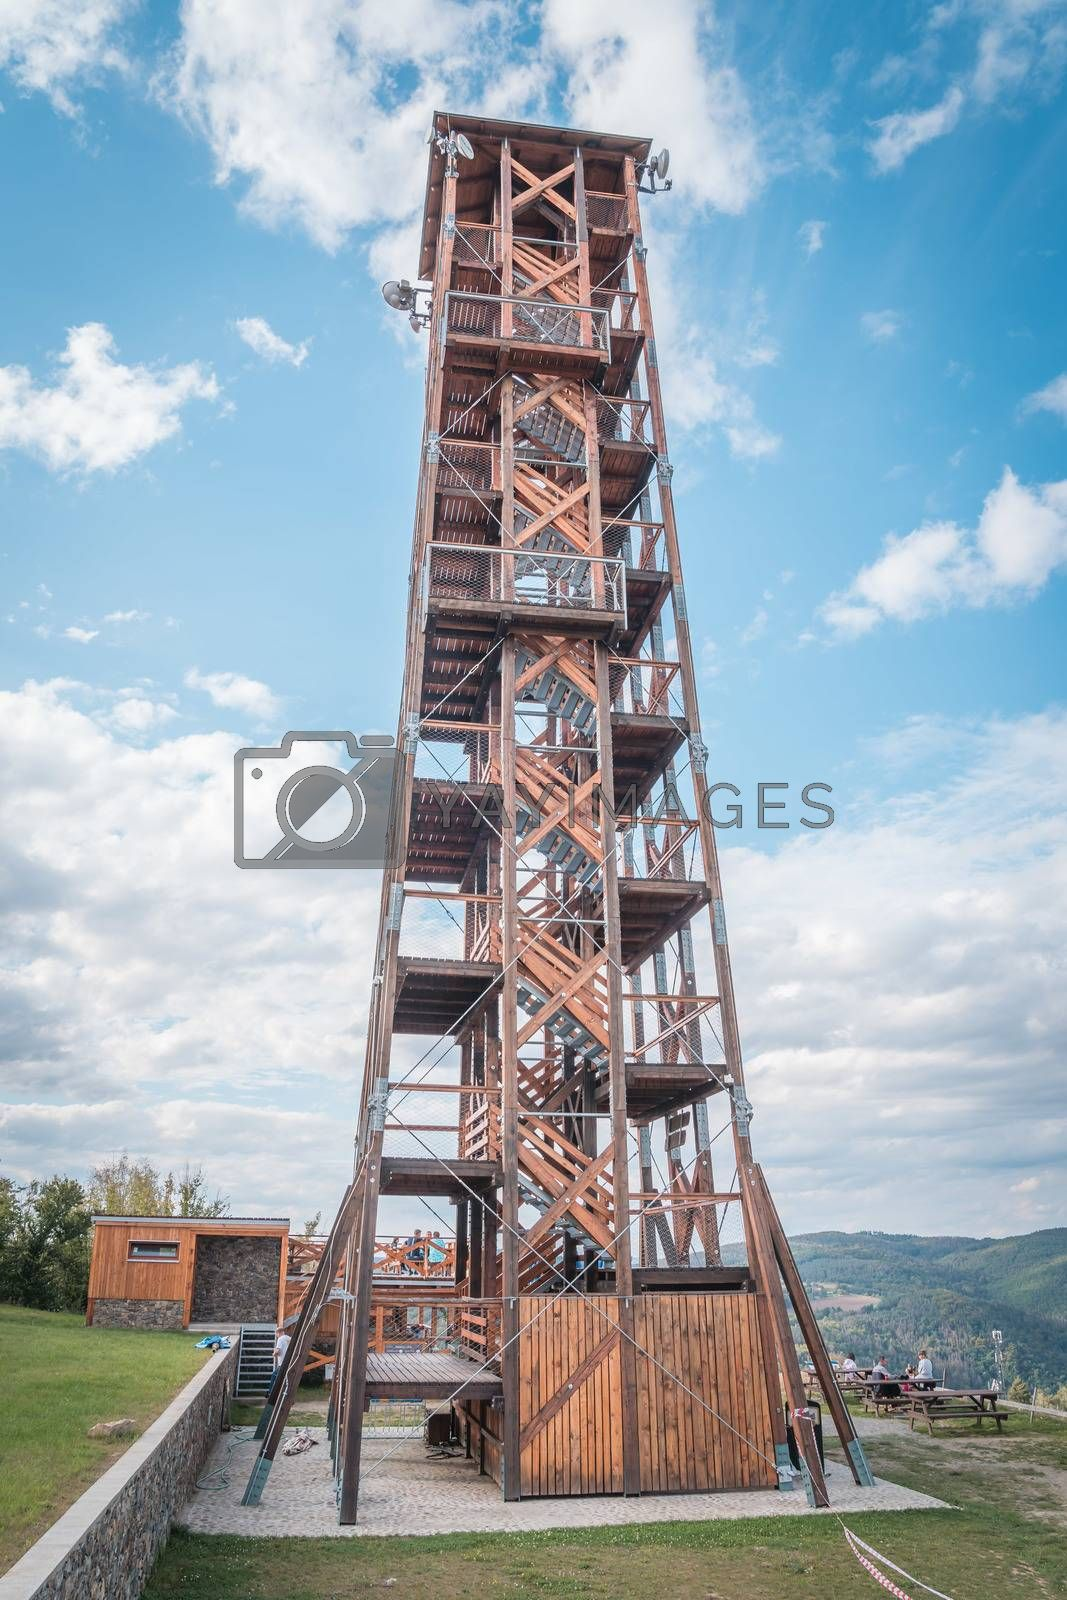 Royalty free image of Observation deck lookout tower called Milada near Orlik dam in evening light, Pribram, Czech republic by petrsvoboda91